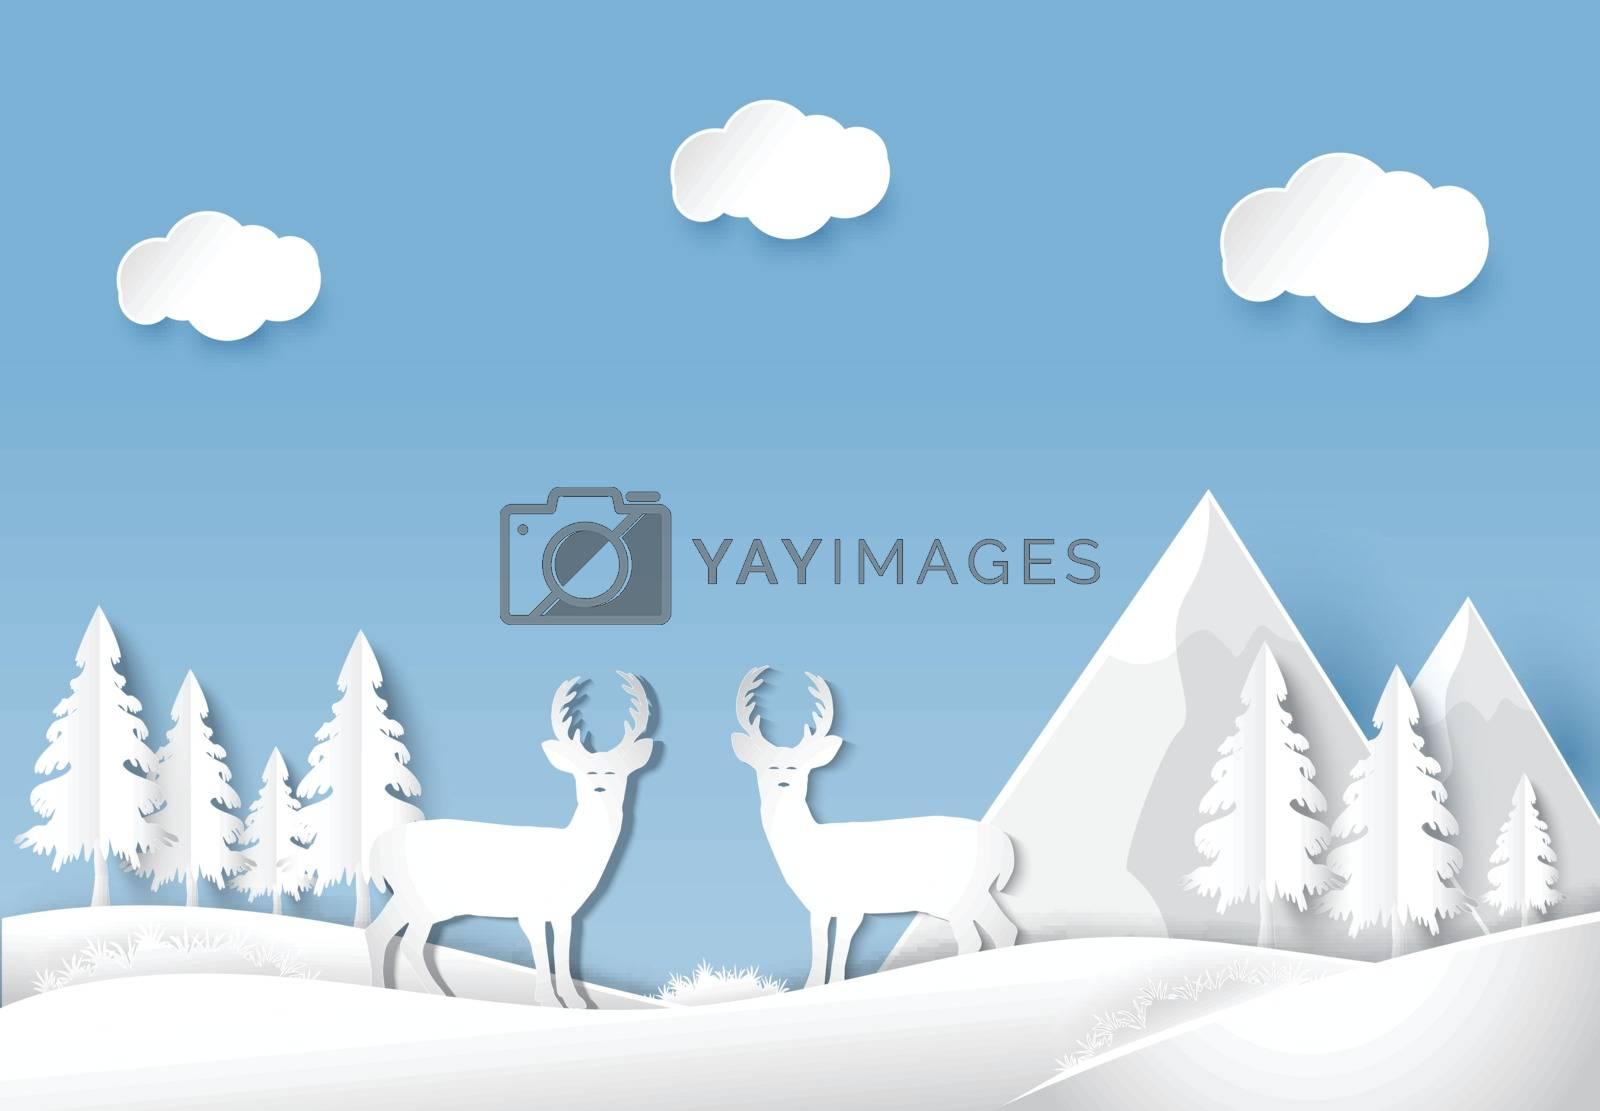 Deer standing in forest. Nature landscape background  paper art style illustration.